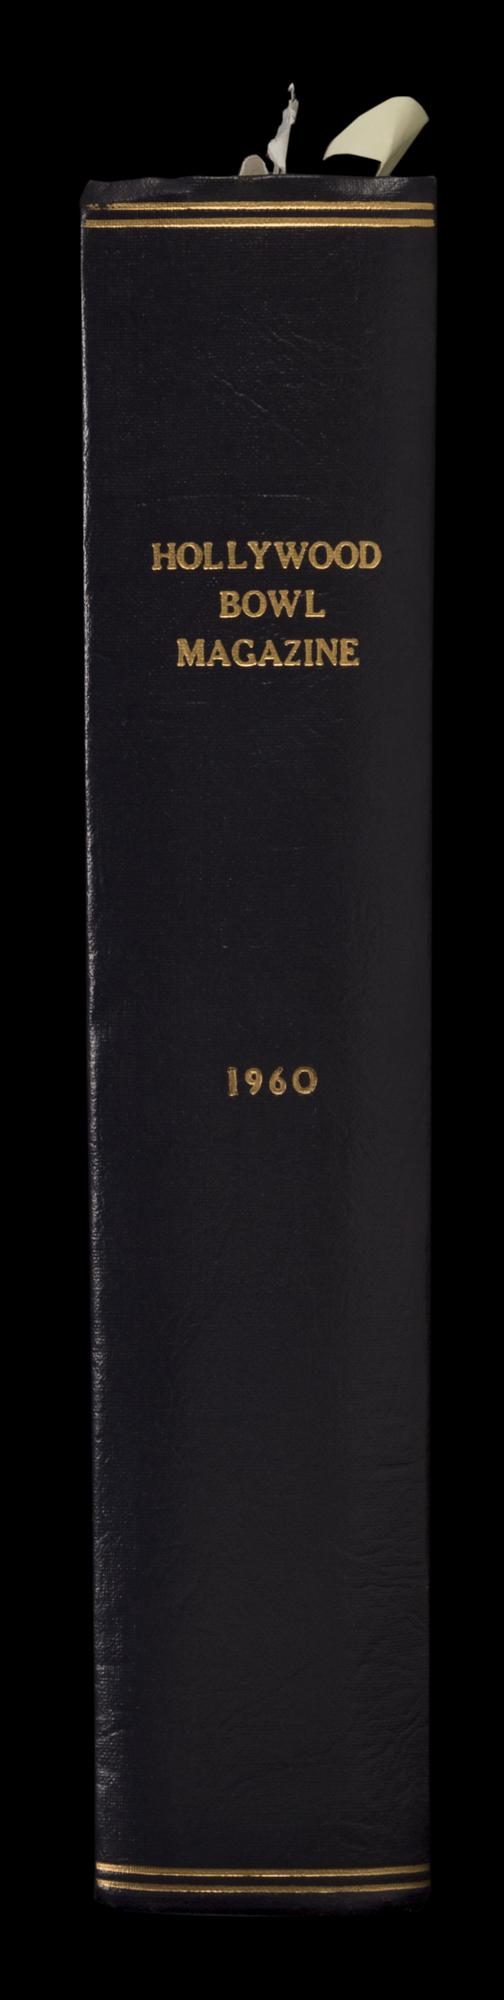 HB_ProgramBook_Spine_1960.jpg